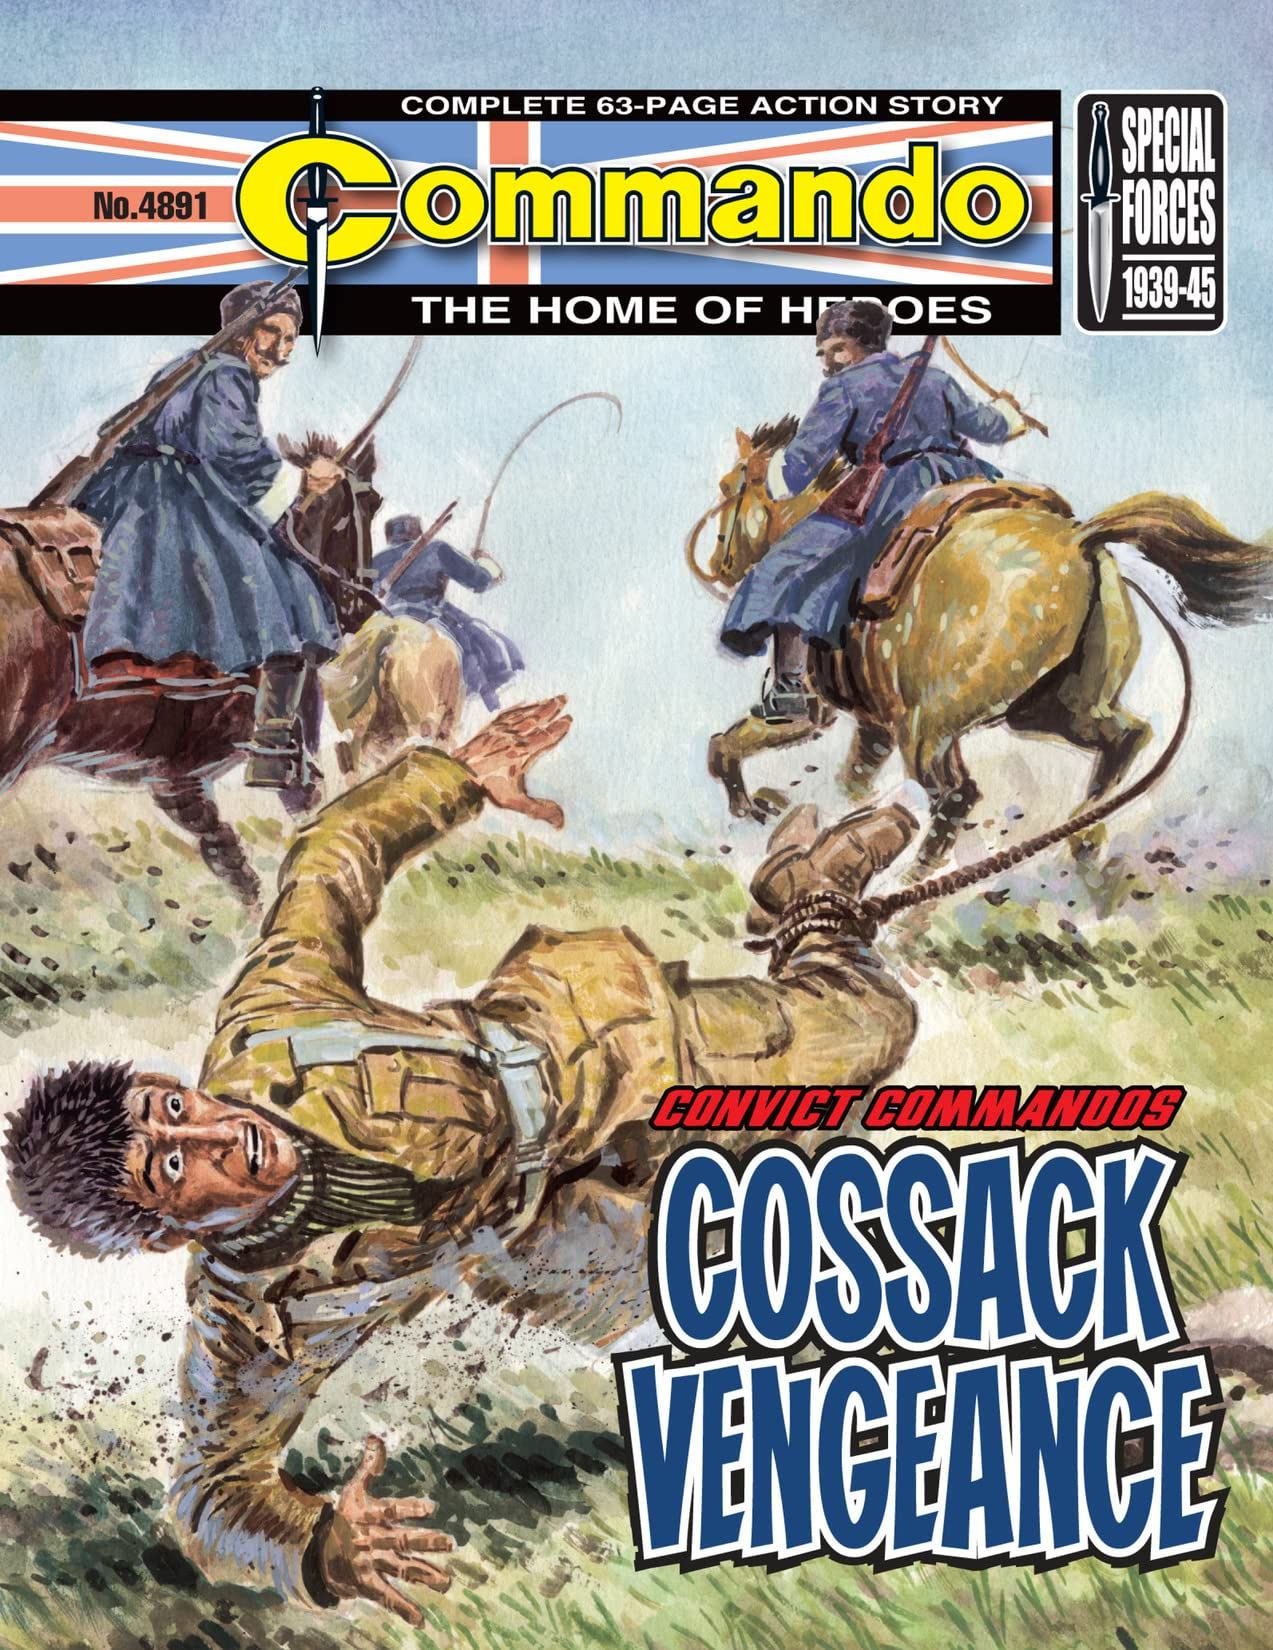 Commando #4891: Convict Commandos - Cossack Vengeance